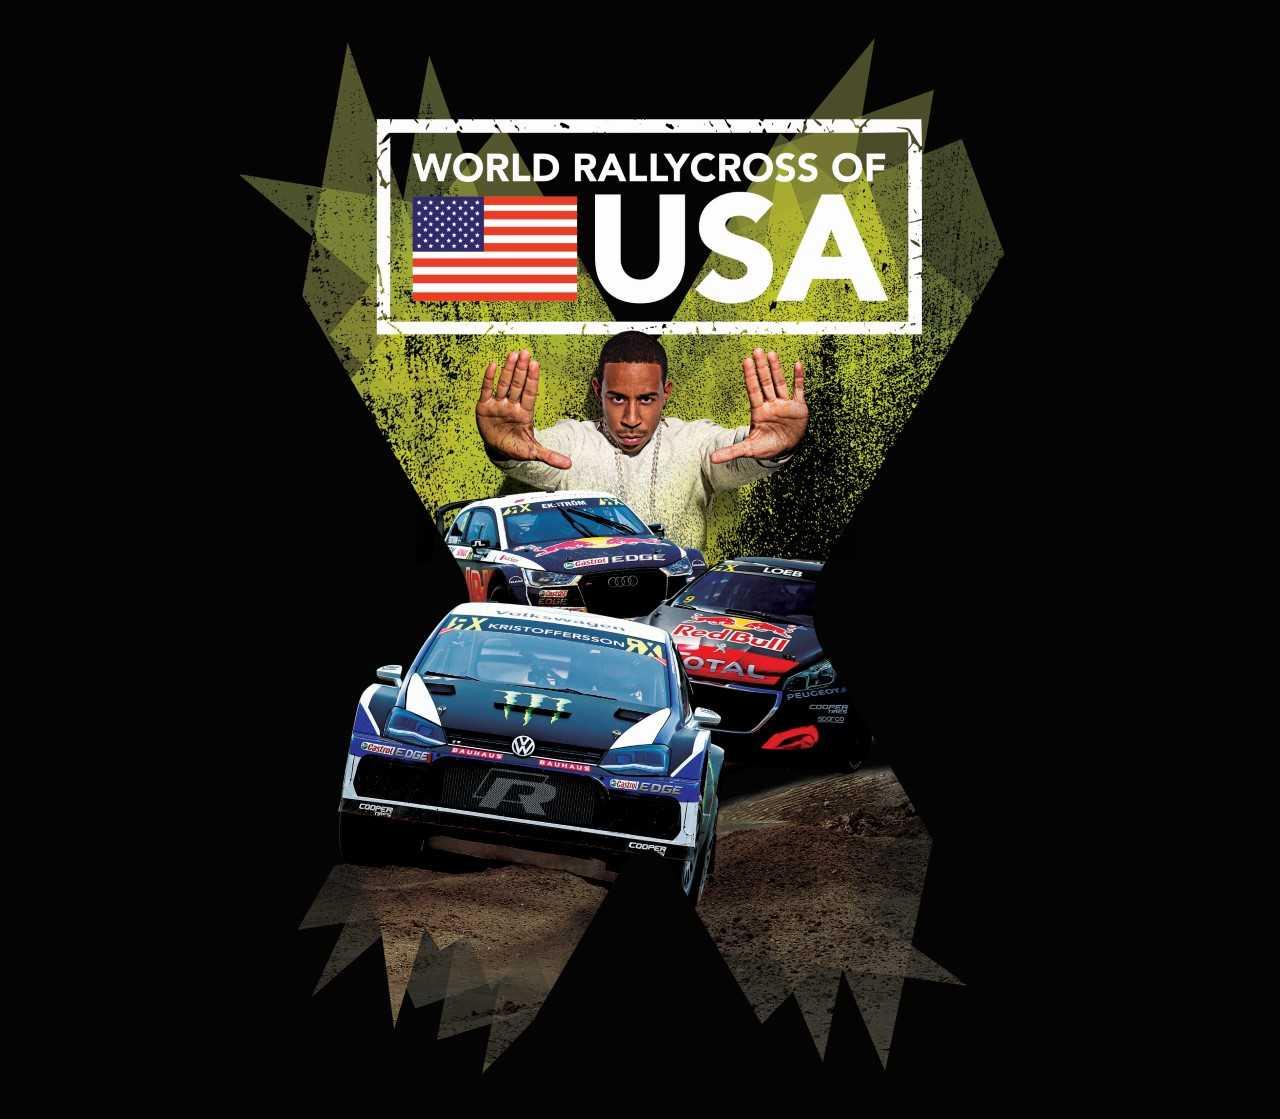 world rallycross ludacris_1526992158387.jpg.jpg